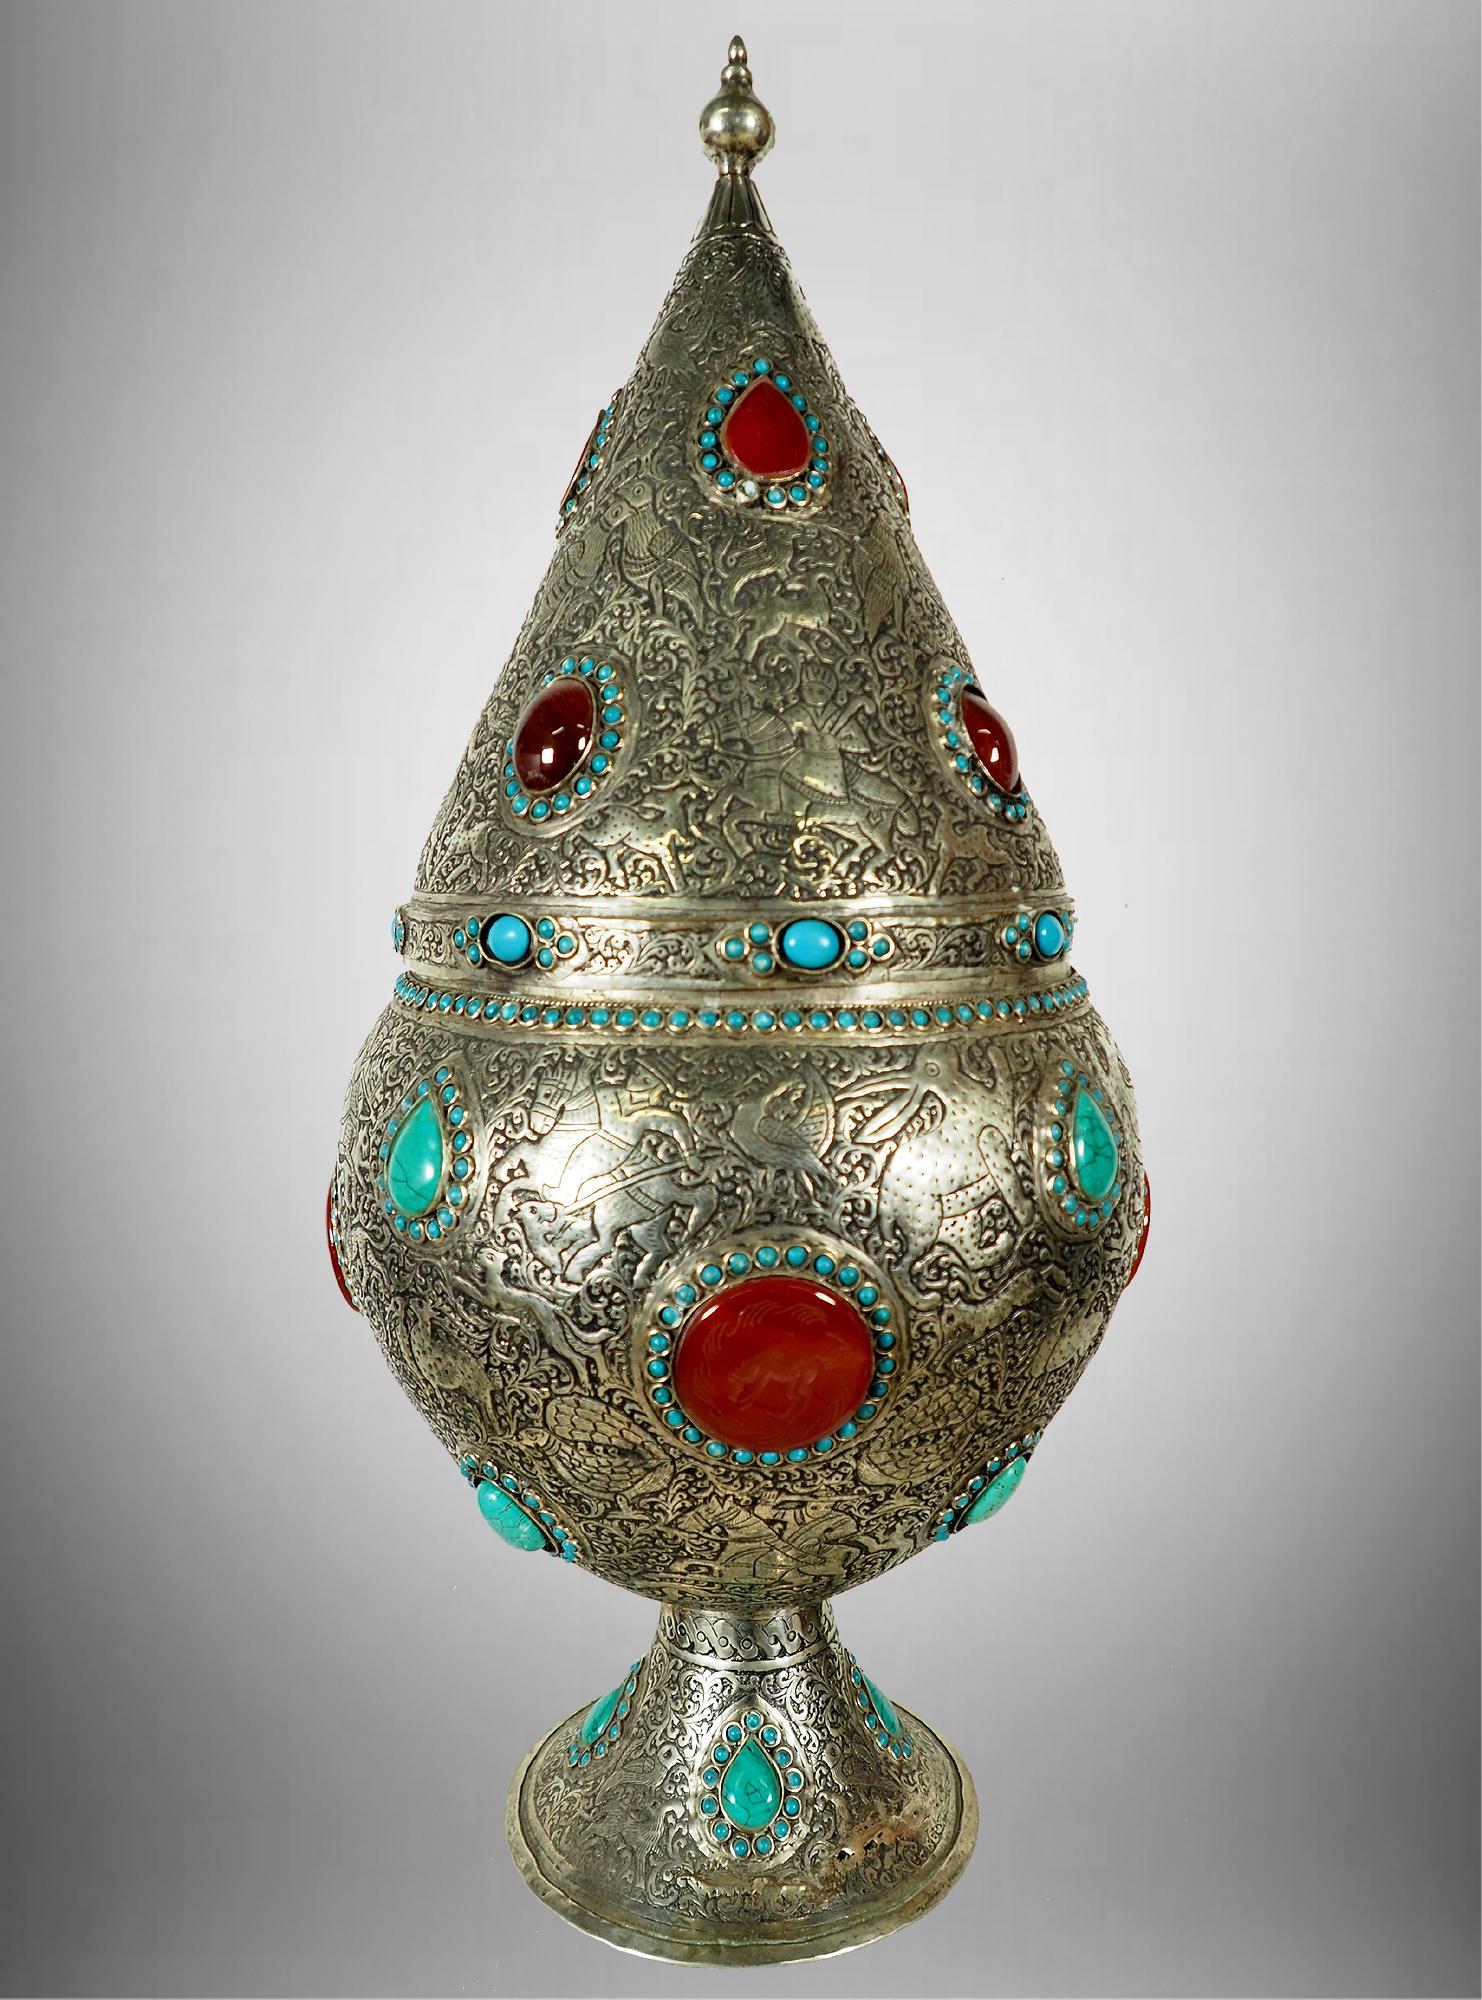 Extravagant orient nickel silver box casket Tin box jewelry box casket lidded amphora carnelian turquoise decorated Gadur Afghanistan 19/A